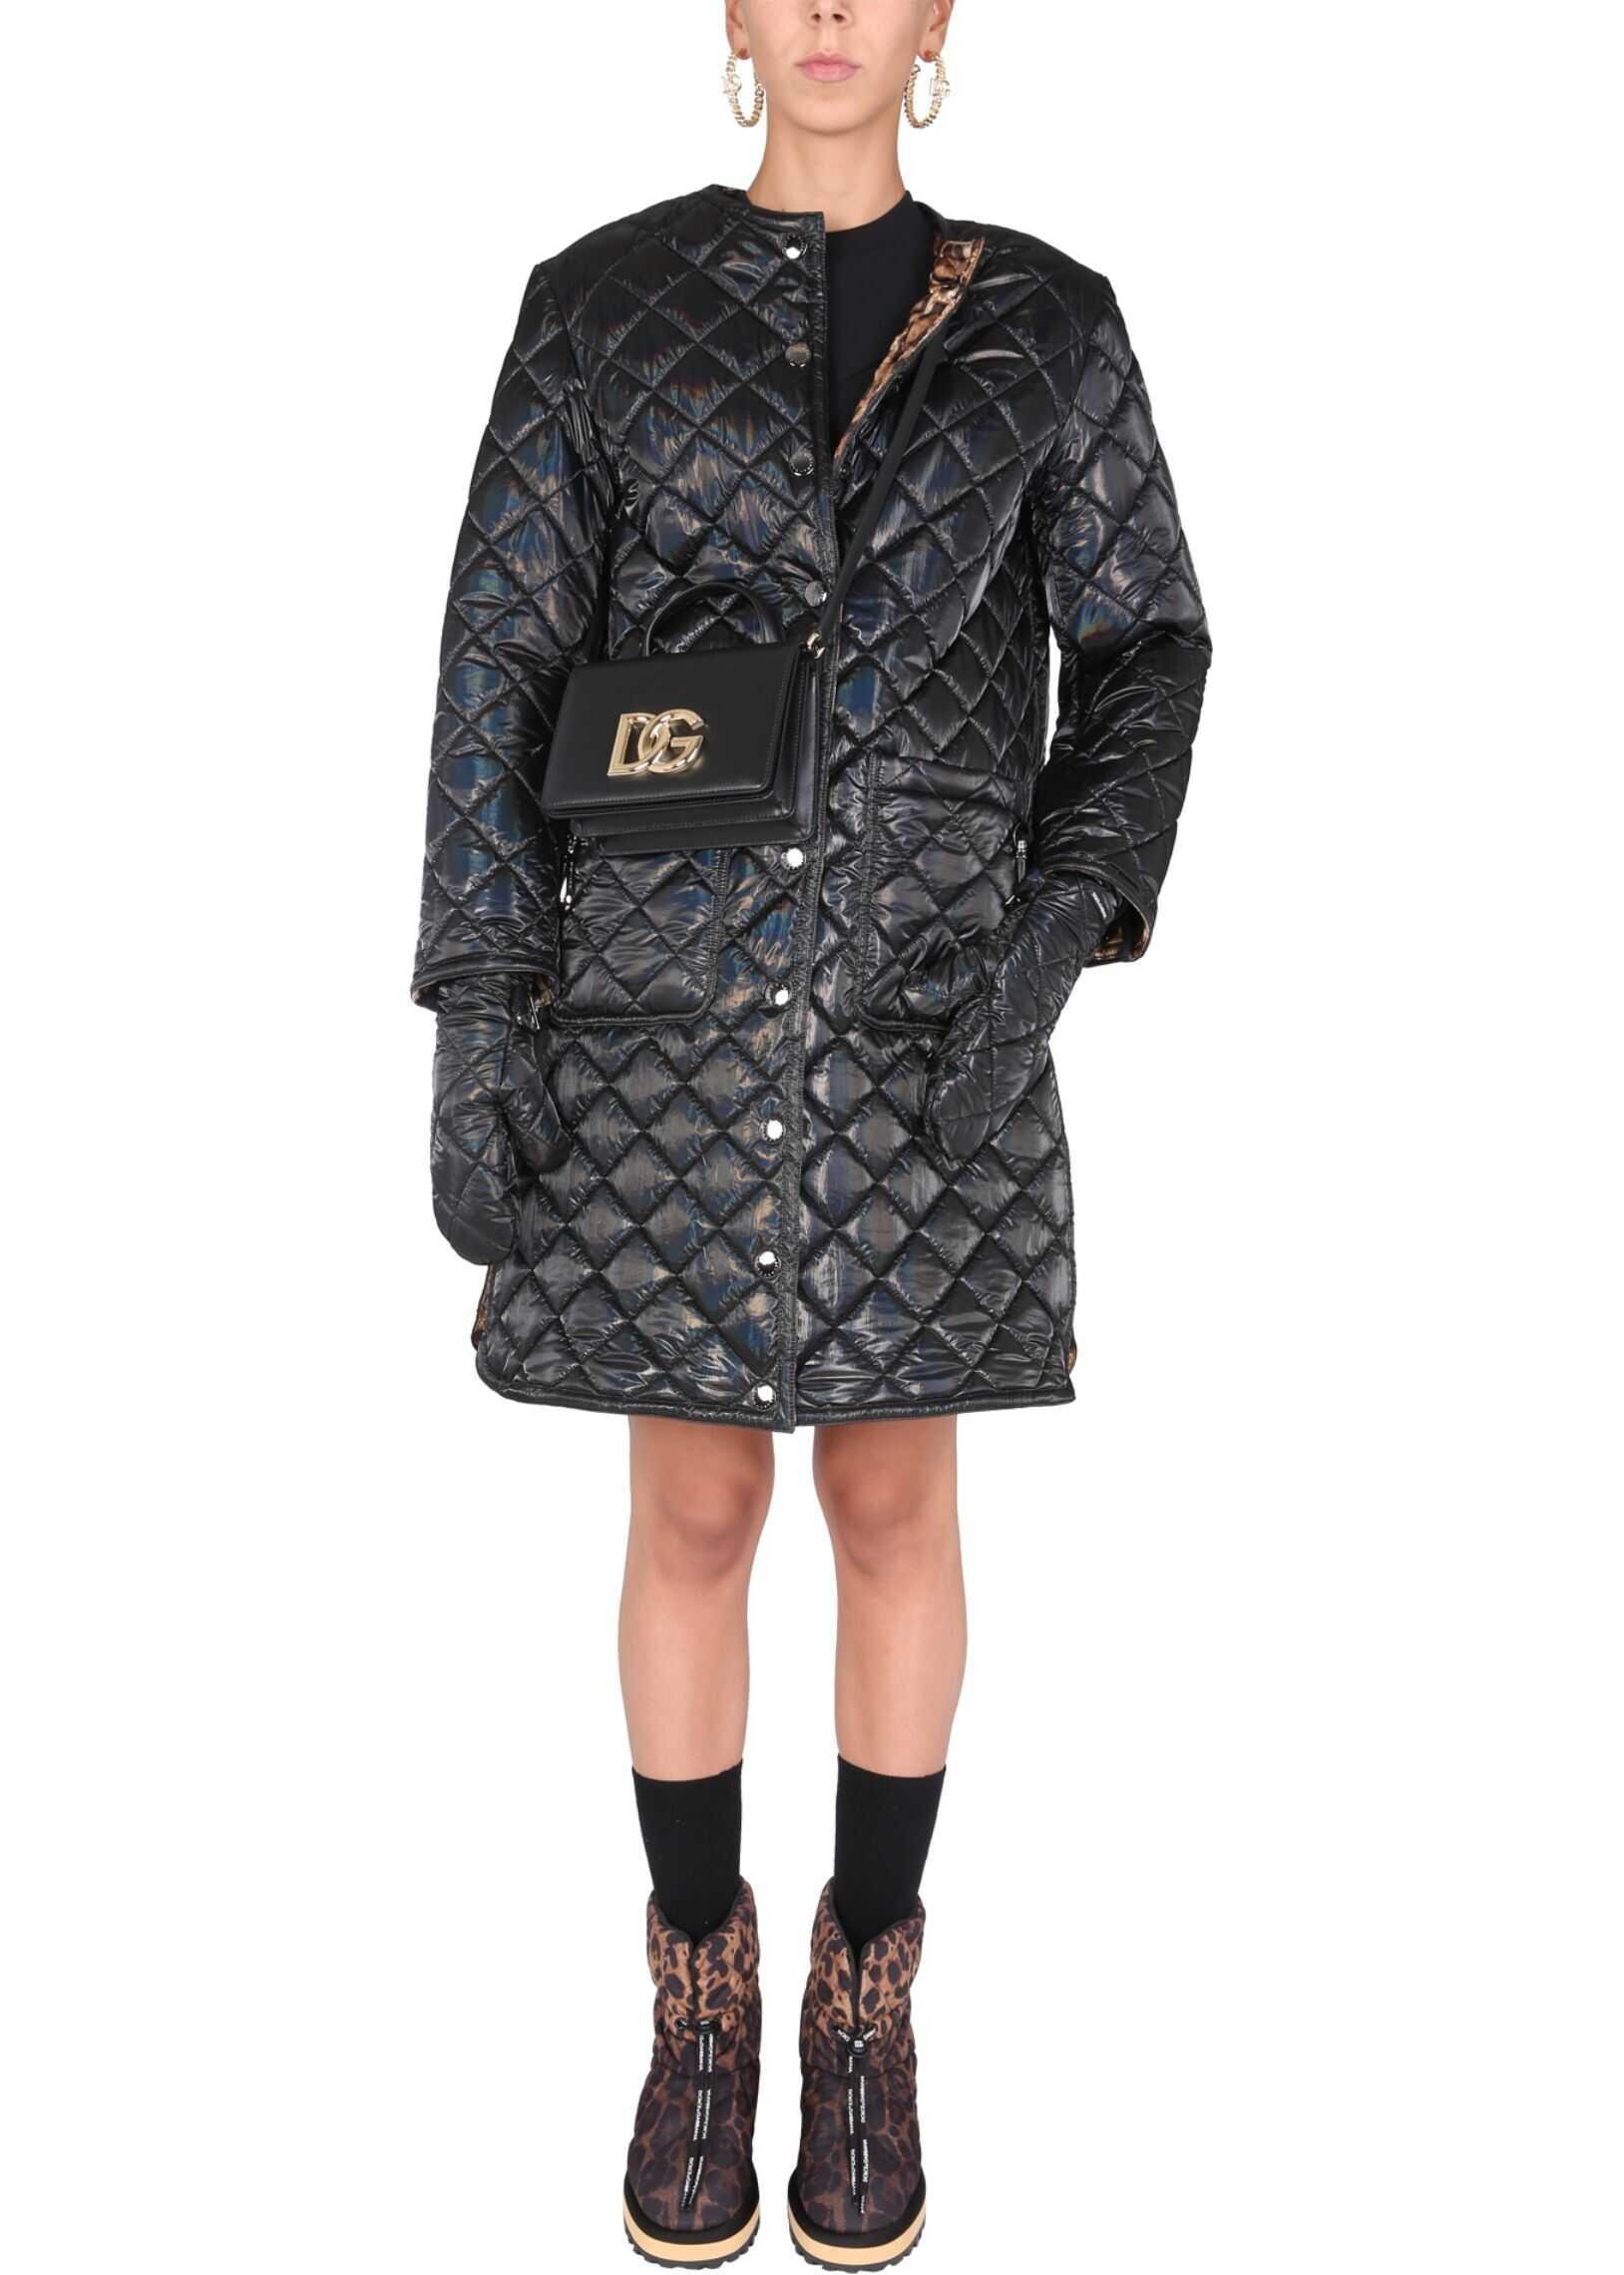 Dolce & Gabbana Matelasse Canvas Coat F0AR5T_FUSOHN0000 BLACK image0